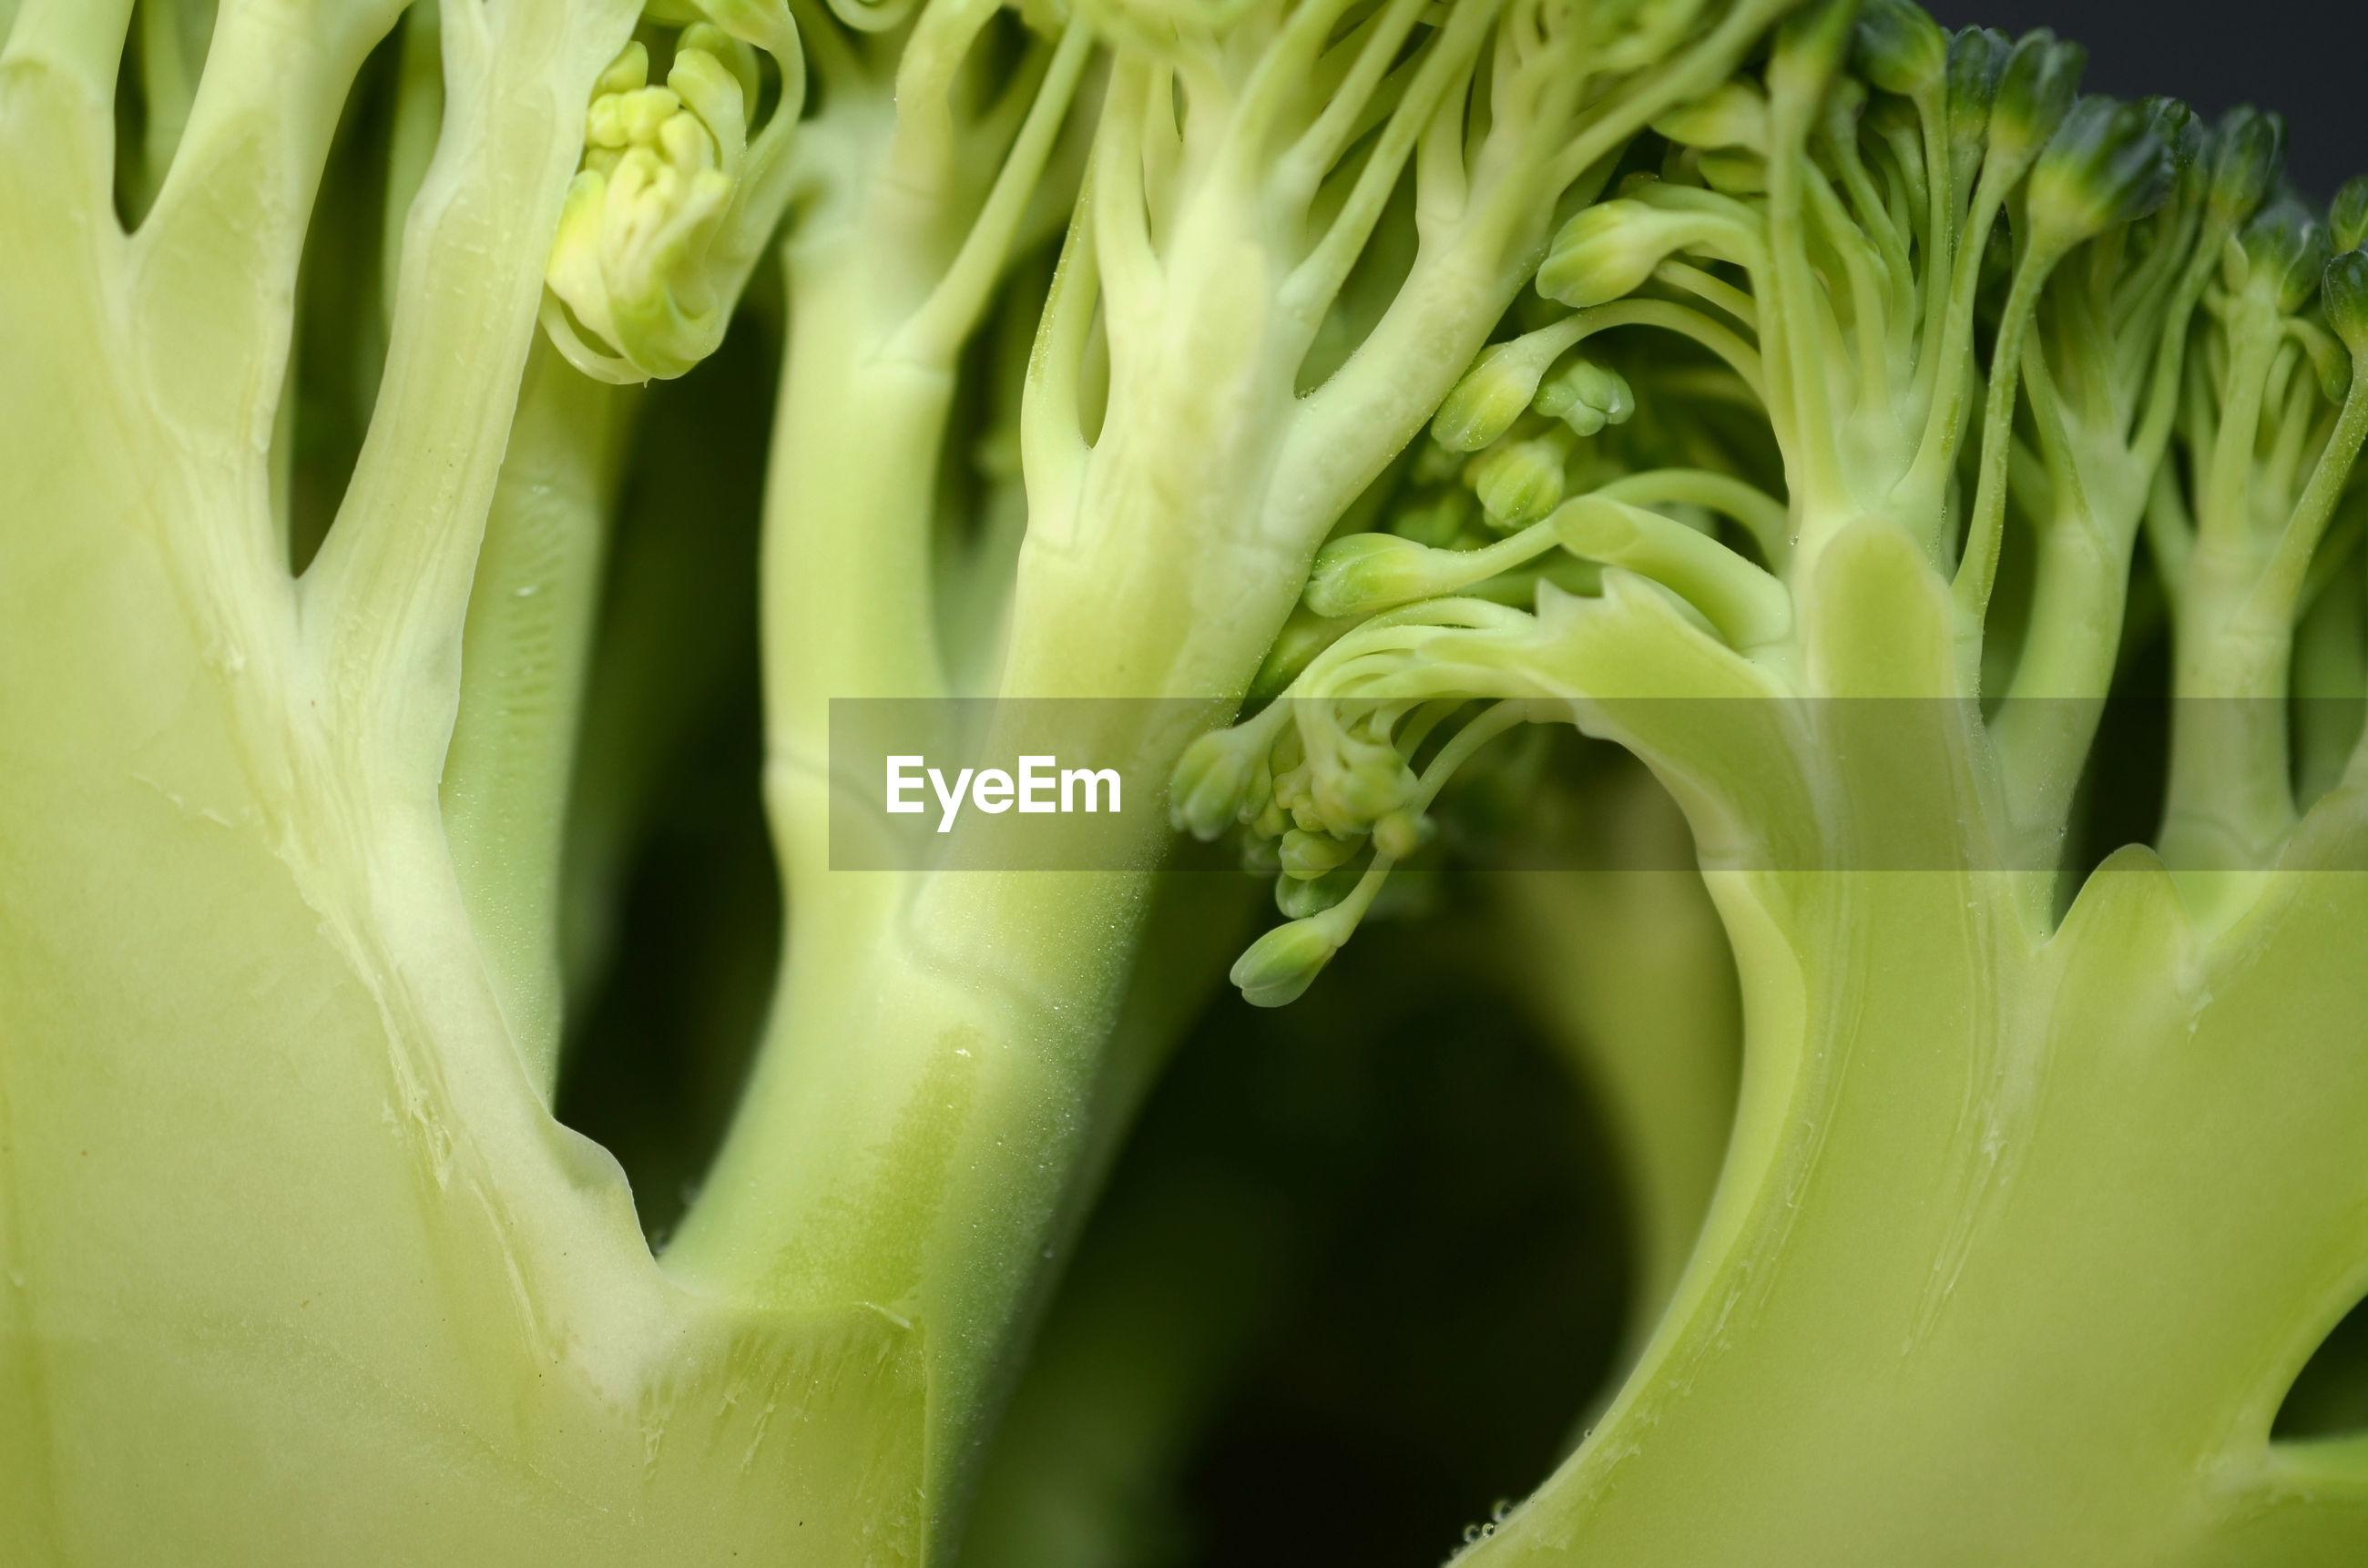 Cross section of broccoli vegetable on close macro shot